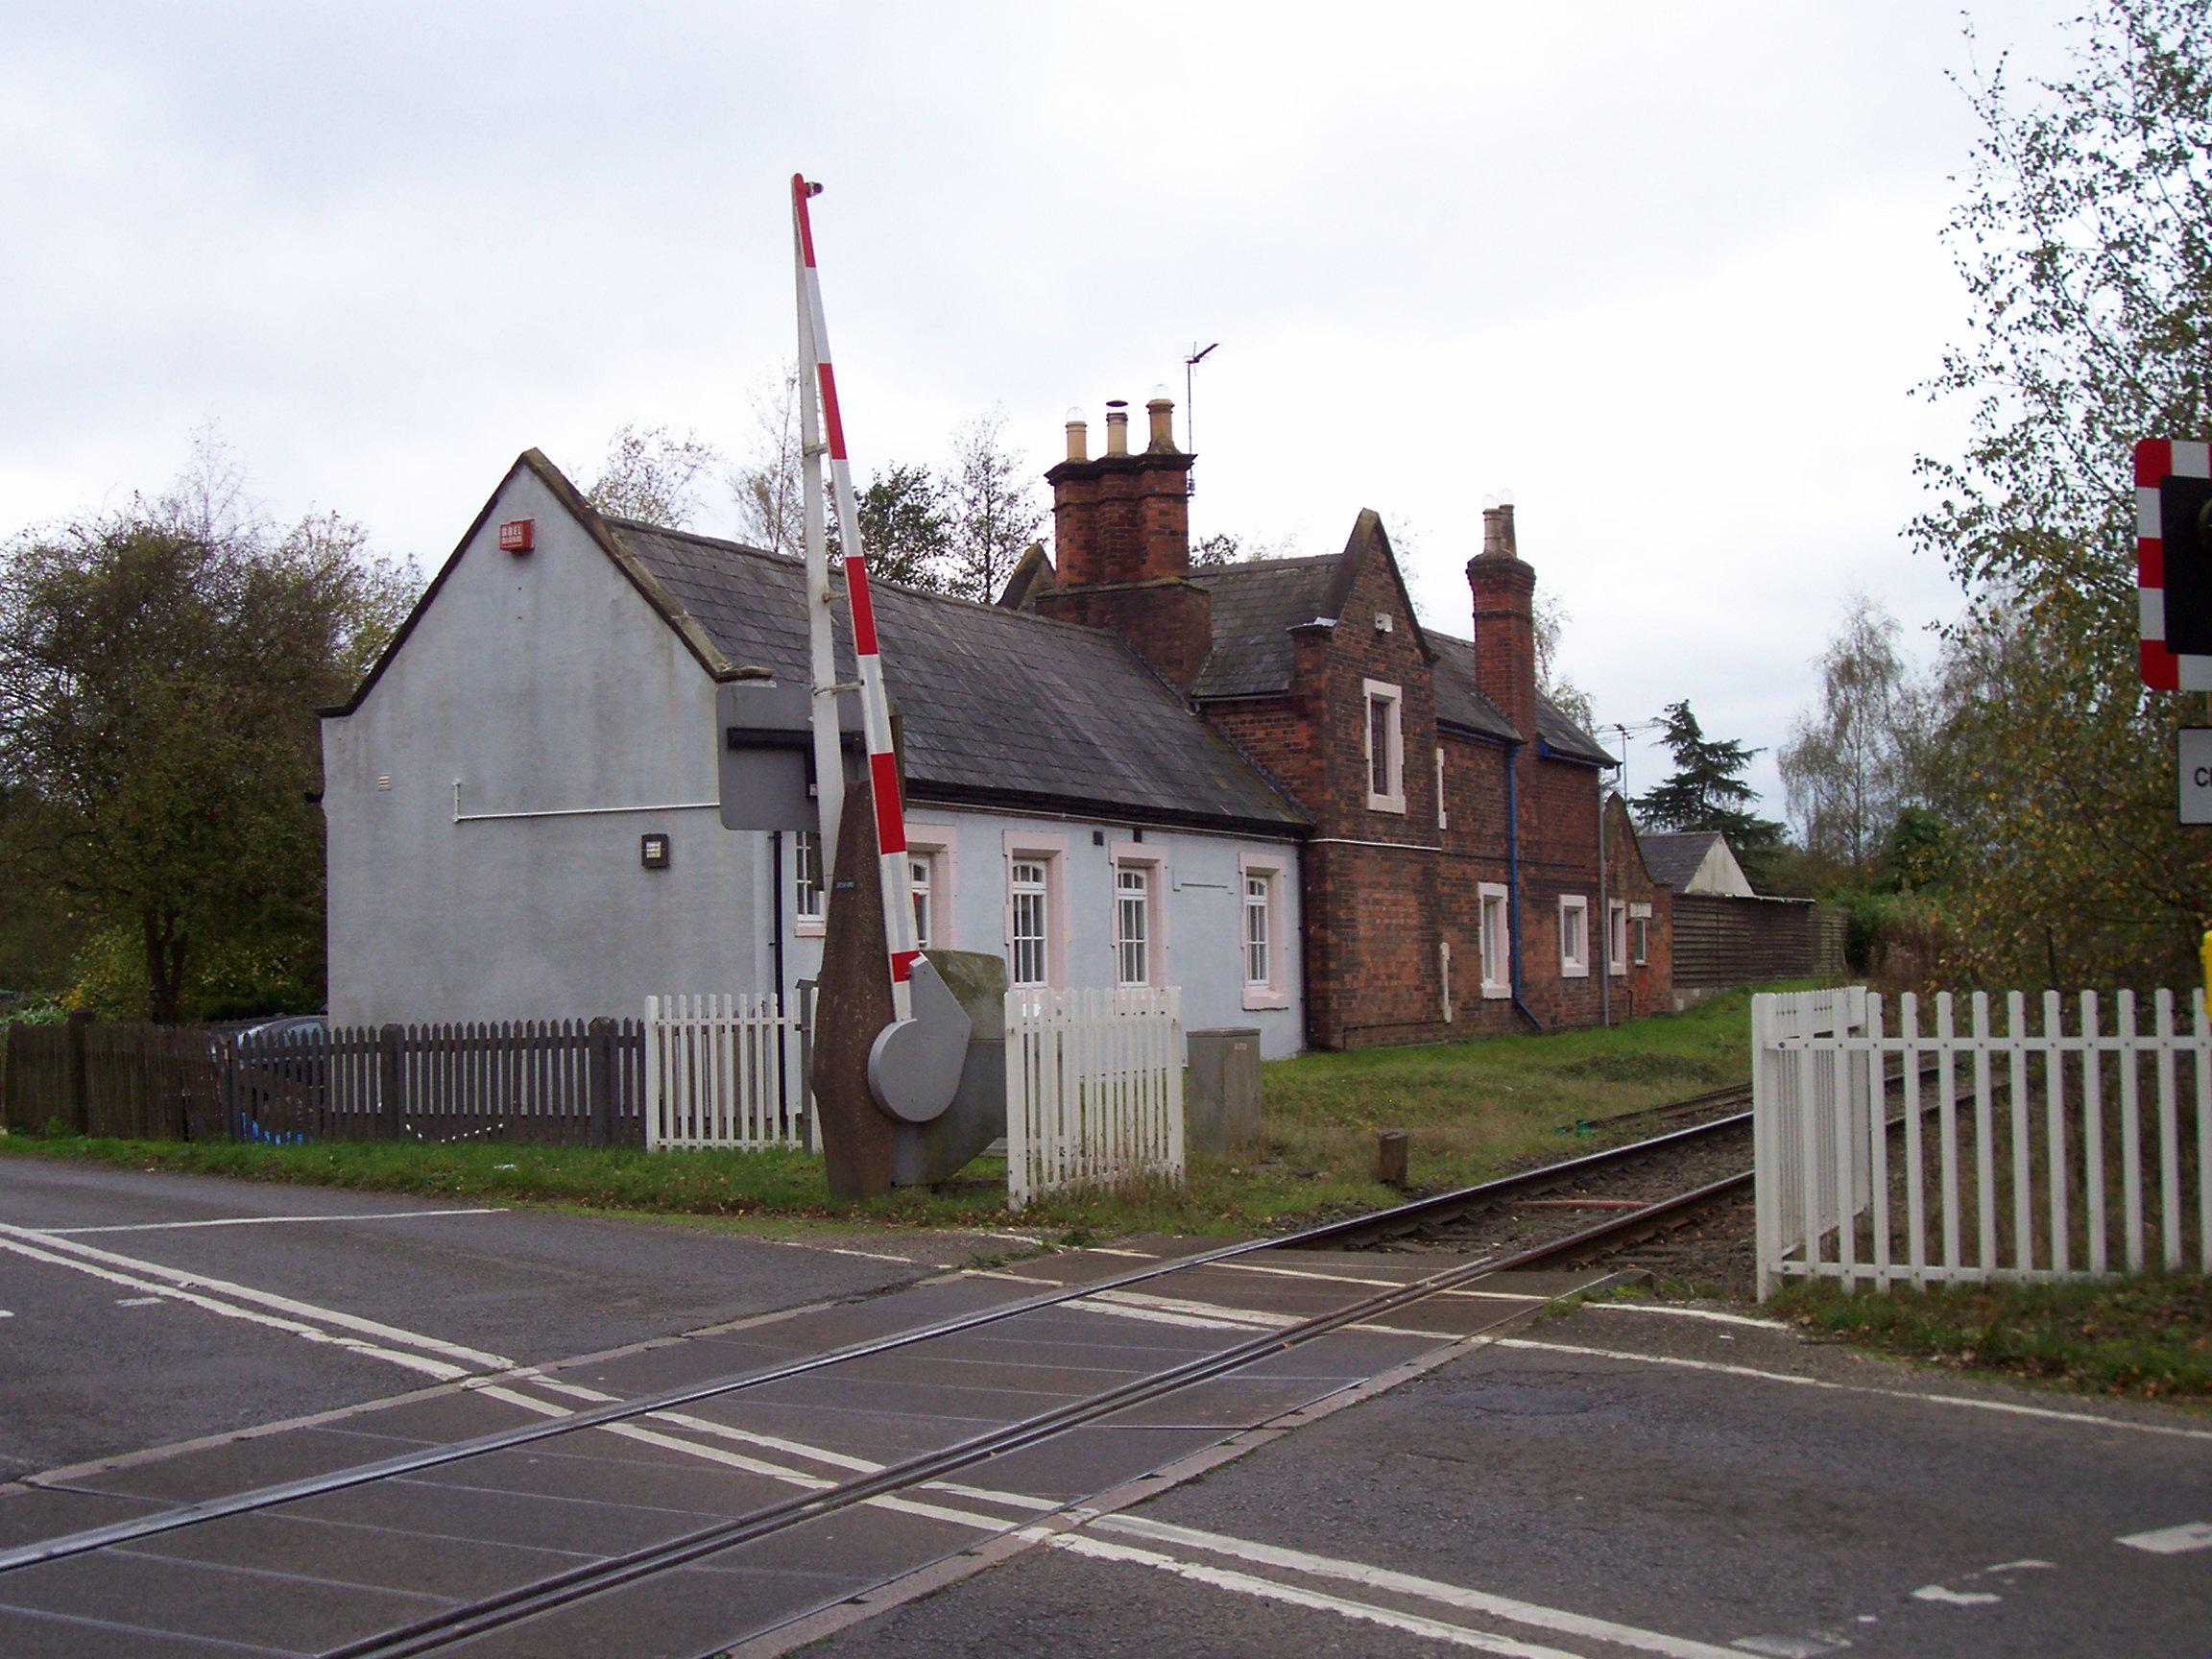 Desford Station